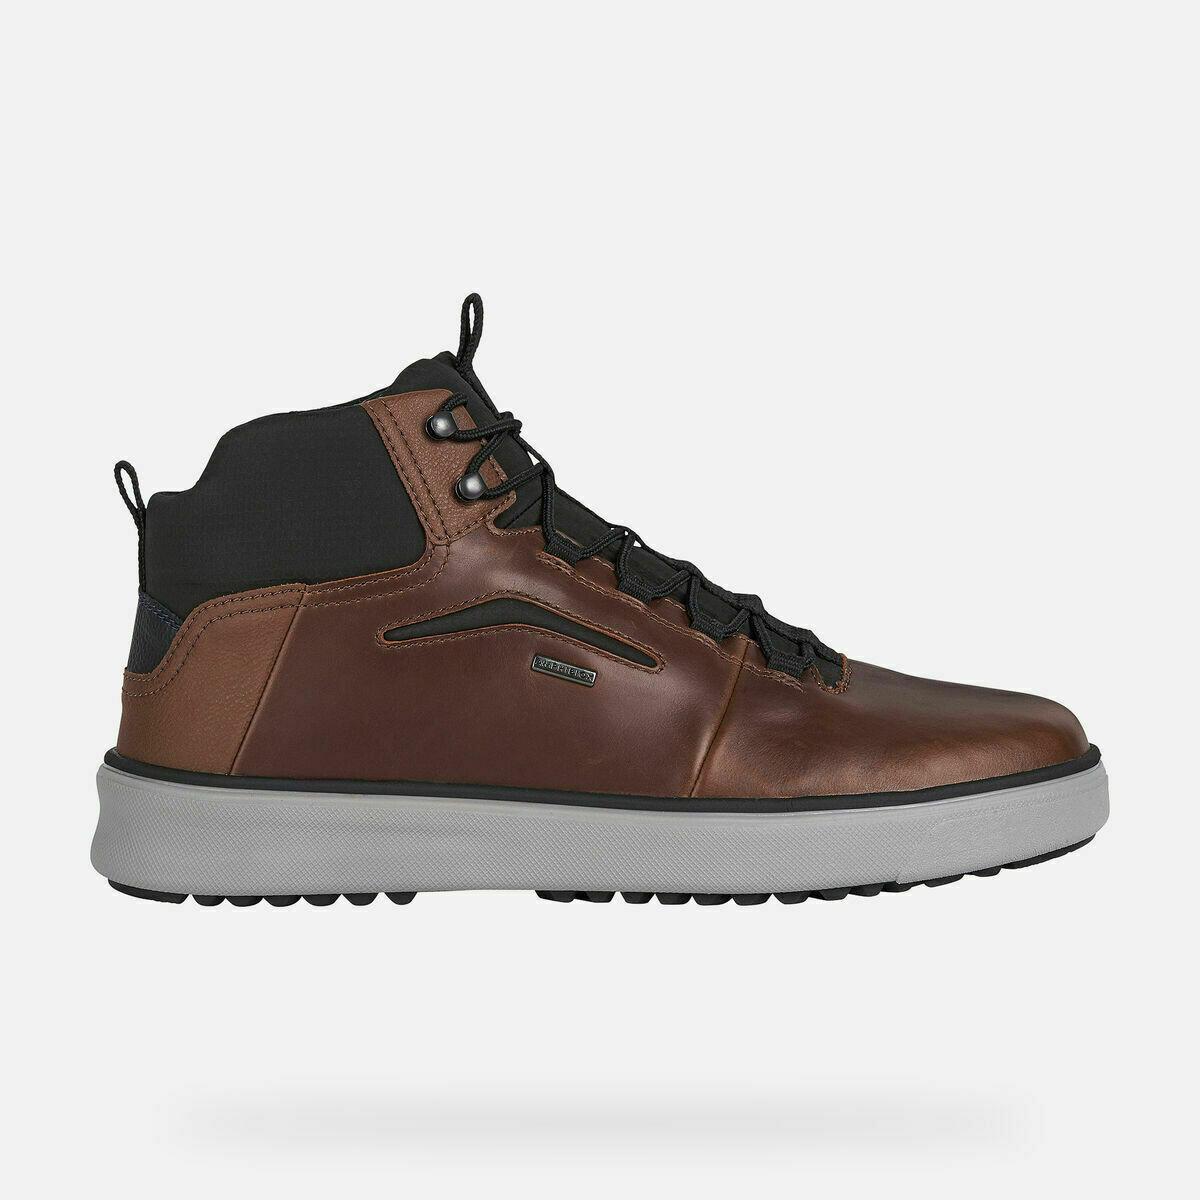 Sneakers alta Geox art. U04AQA colore marrone